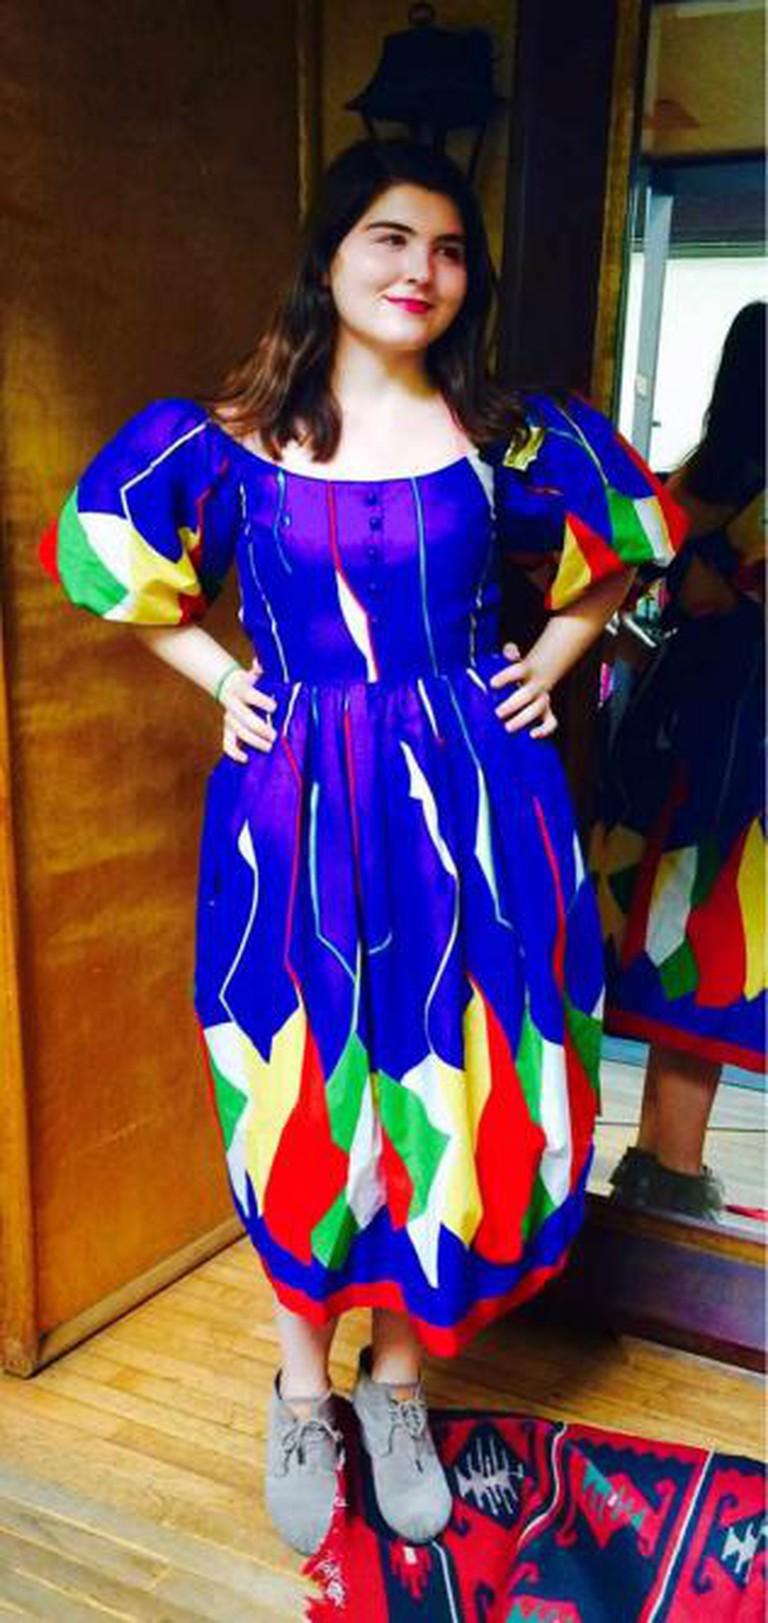 A rainbow dress at Wasteland © Seleba Ouattara